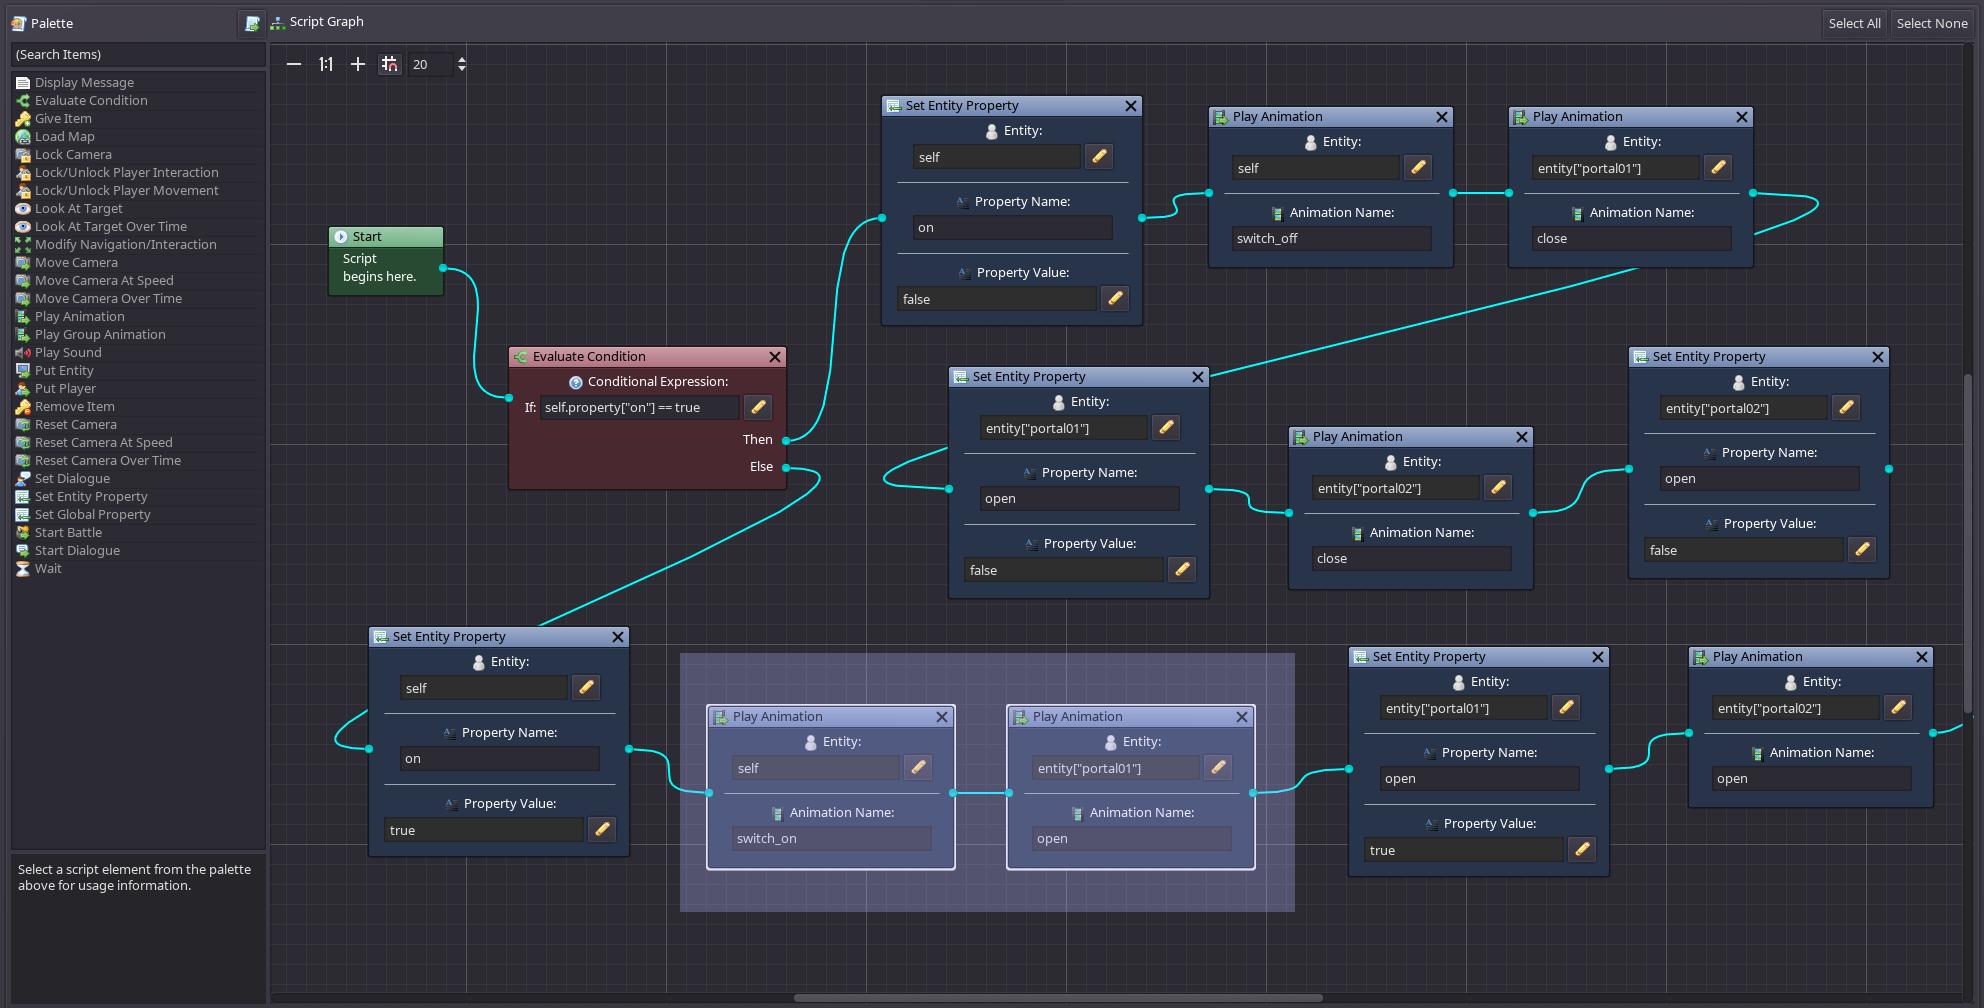 08 script graph updates